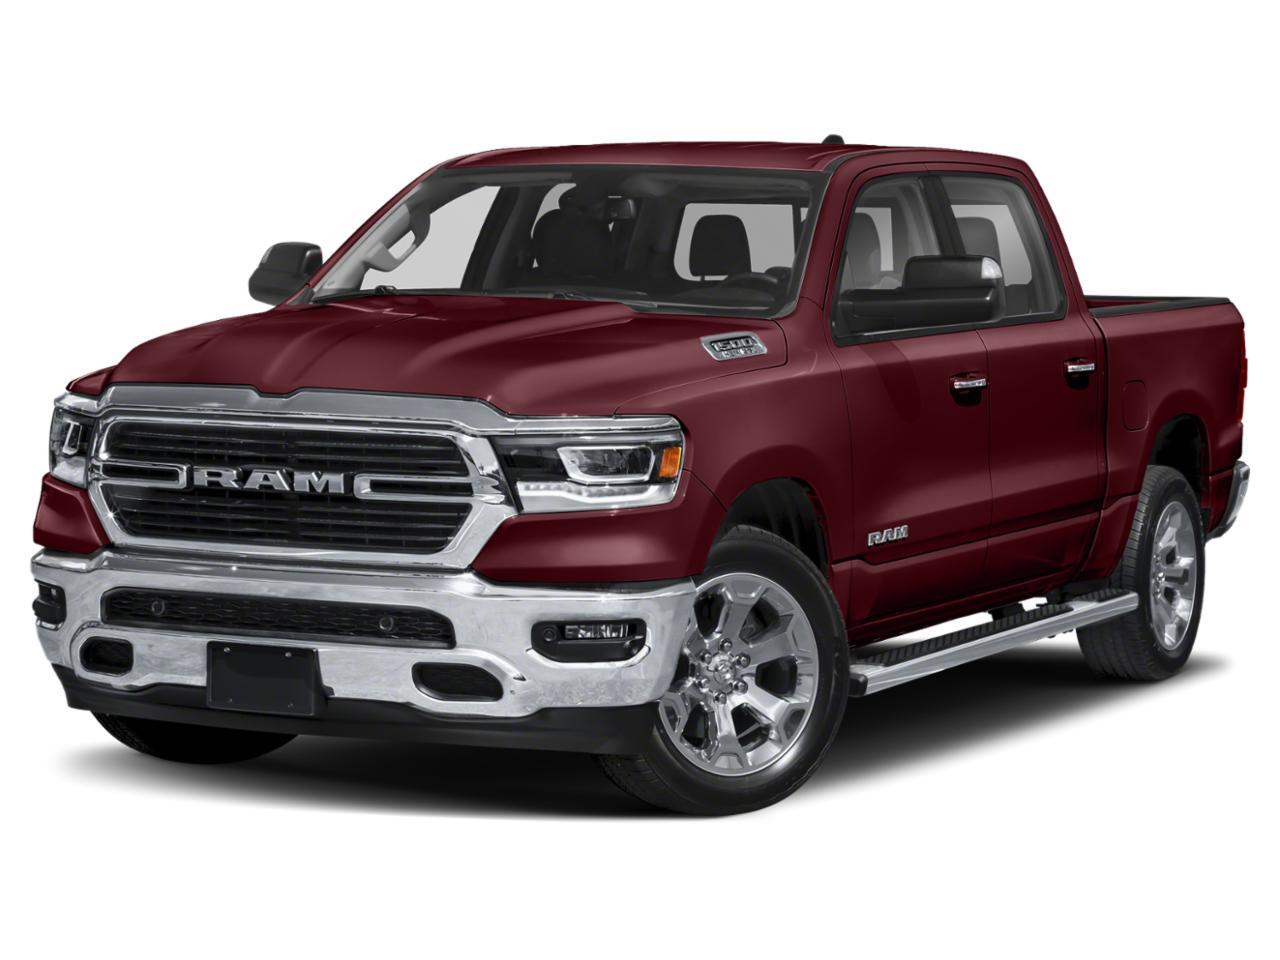 2020 Ram 1500 Vehicle Photo in GARDNER, MA 01440-3110